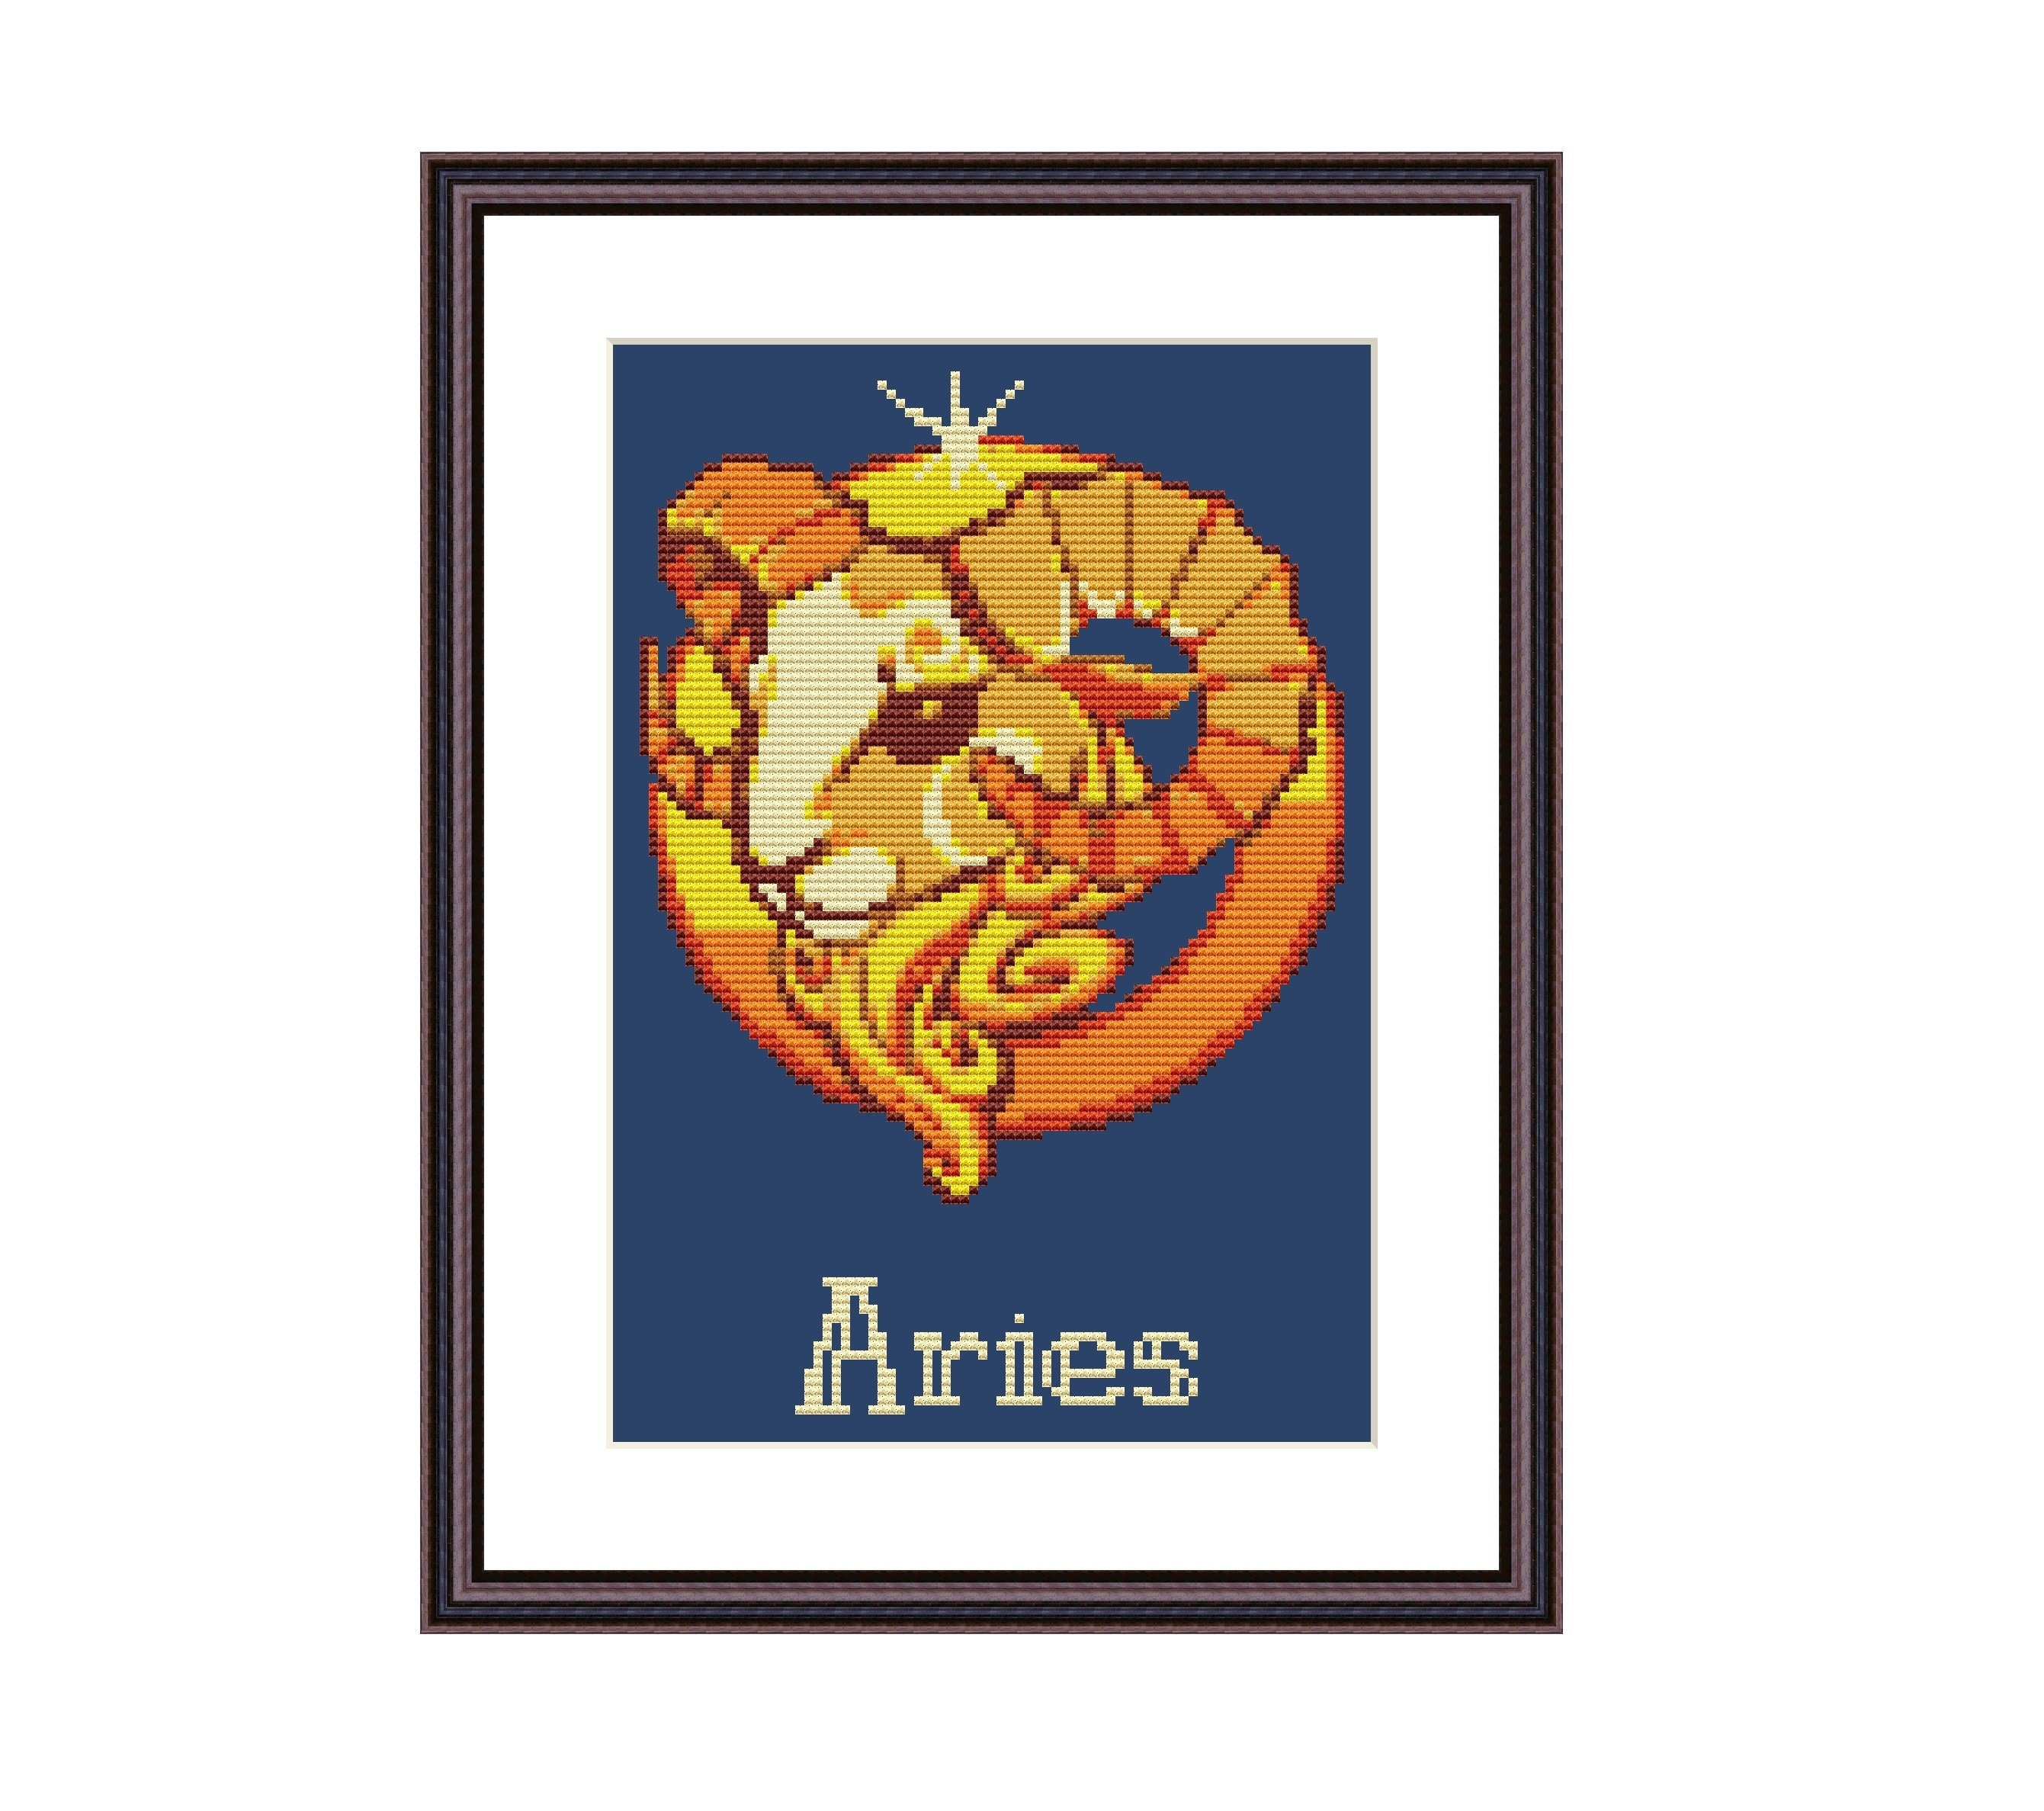 Aries Zodiac Sign Cross Stitch Pattern Instant Download PDF Digital Pattern  Modern Embroidery Horoscope Astrology Xstitch Birthday Present